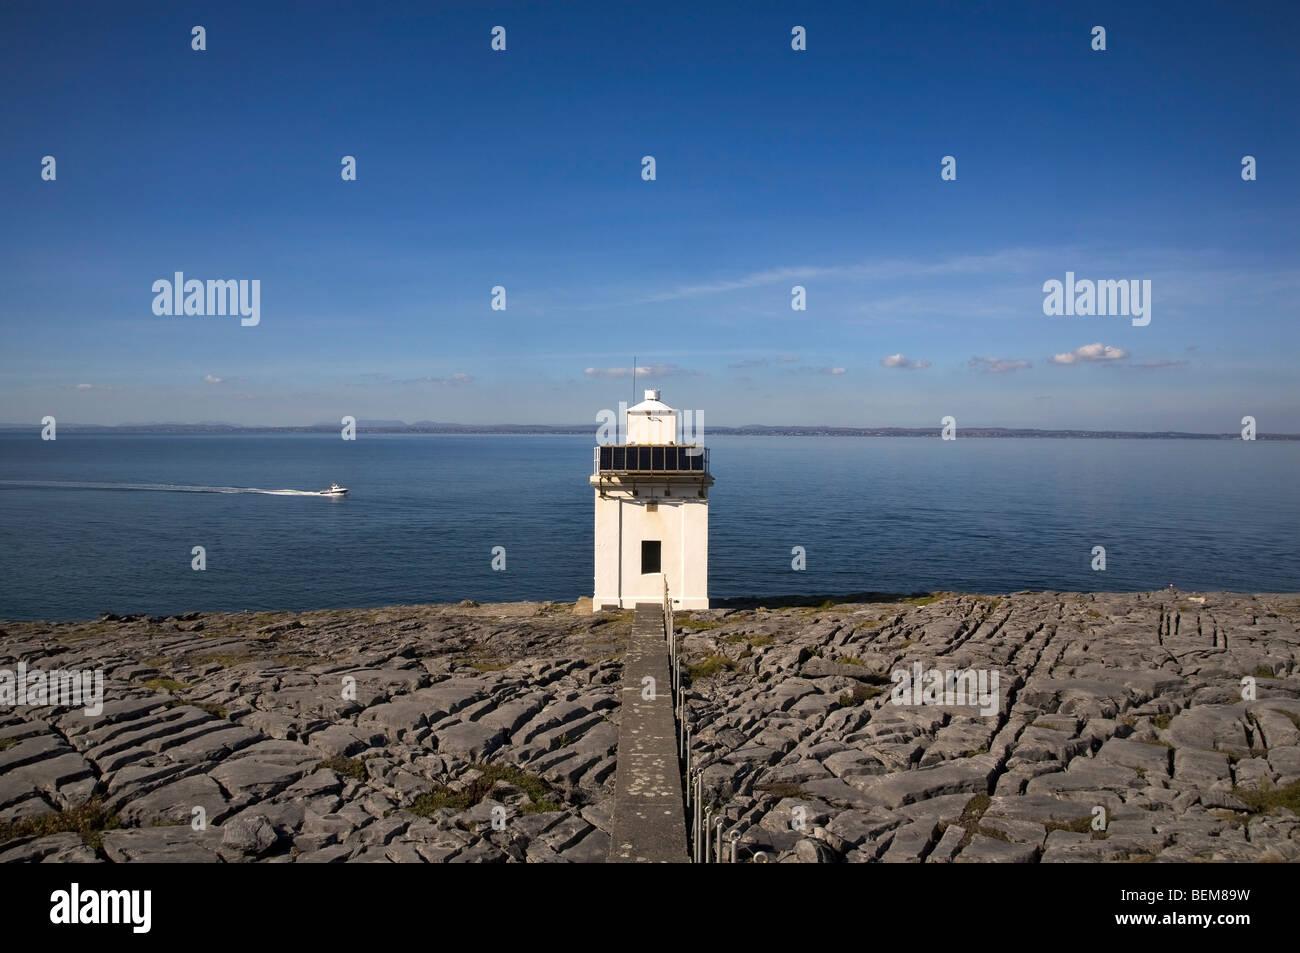 Blackhead Lighthouse overlooking Galway Bay, The Burren, County Clare, Ireland - Stock Image